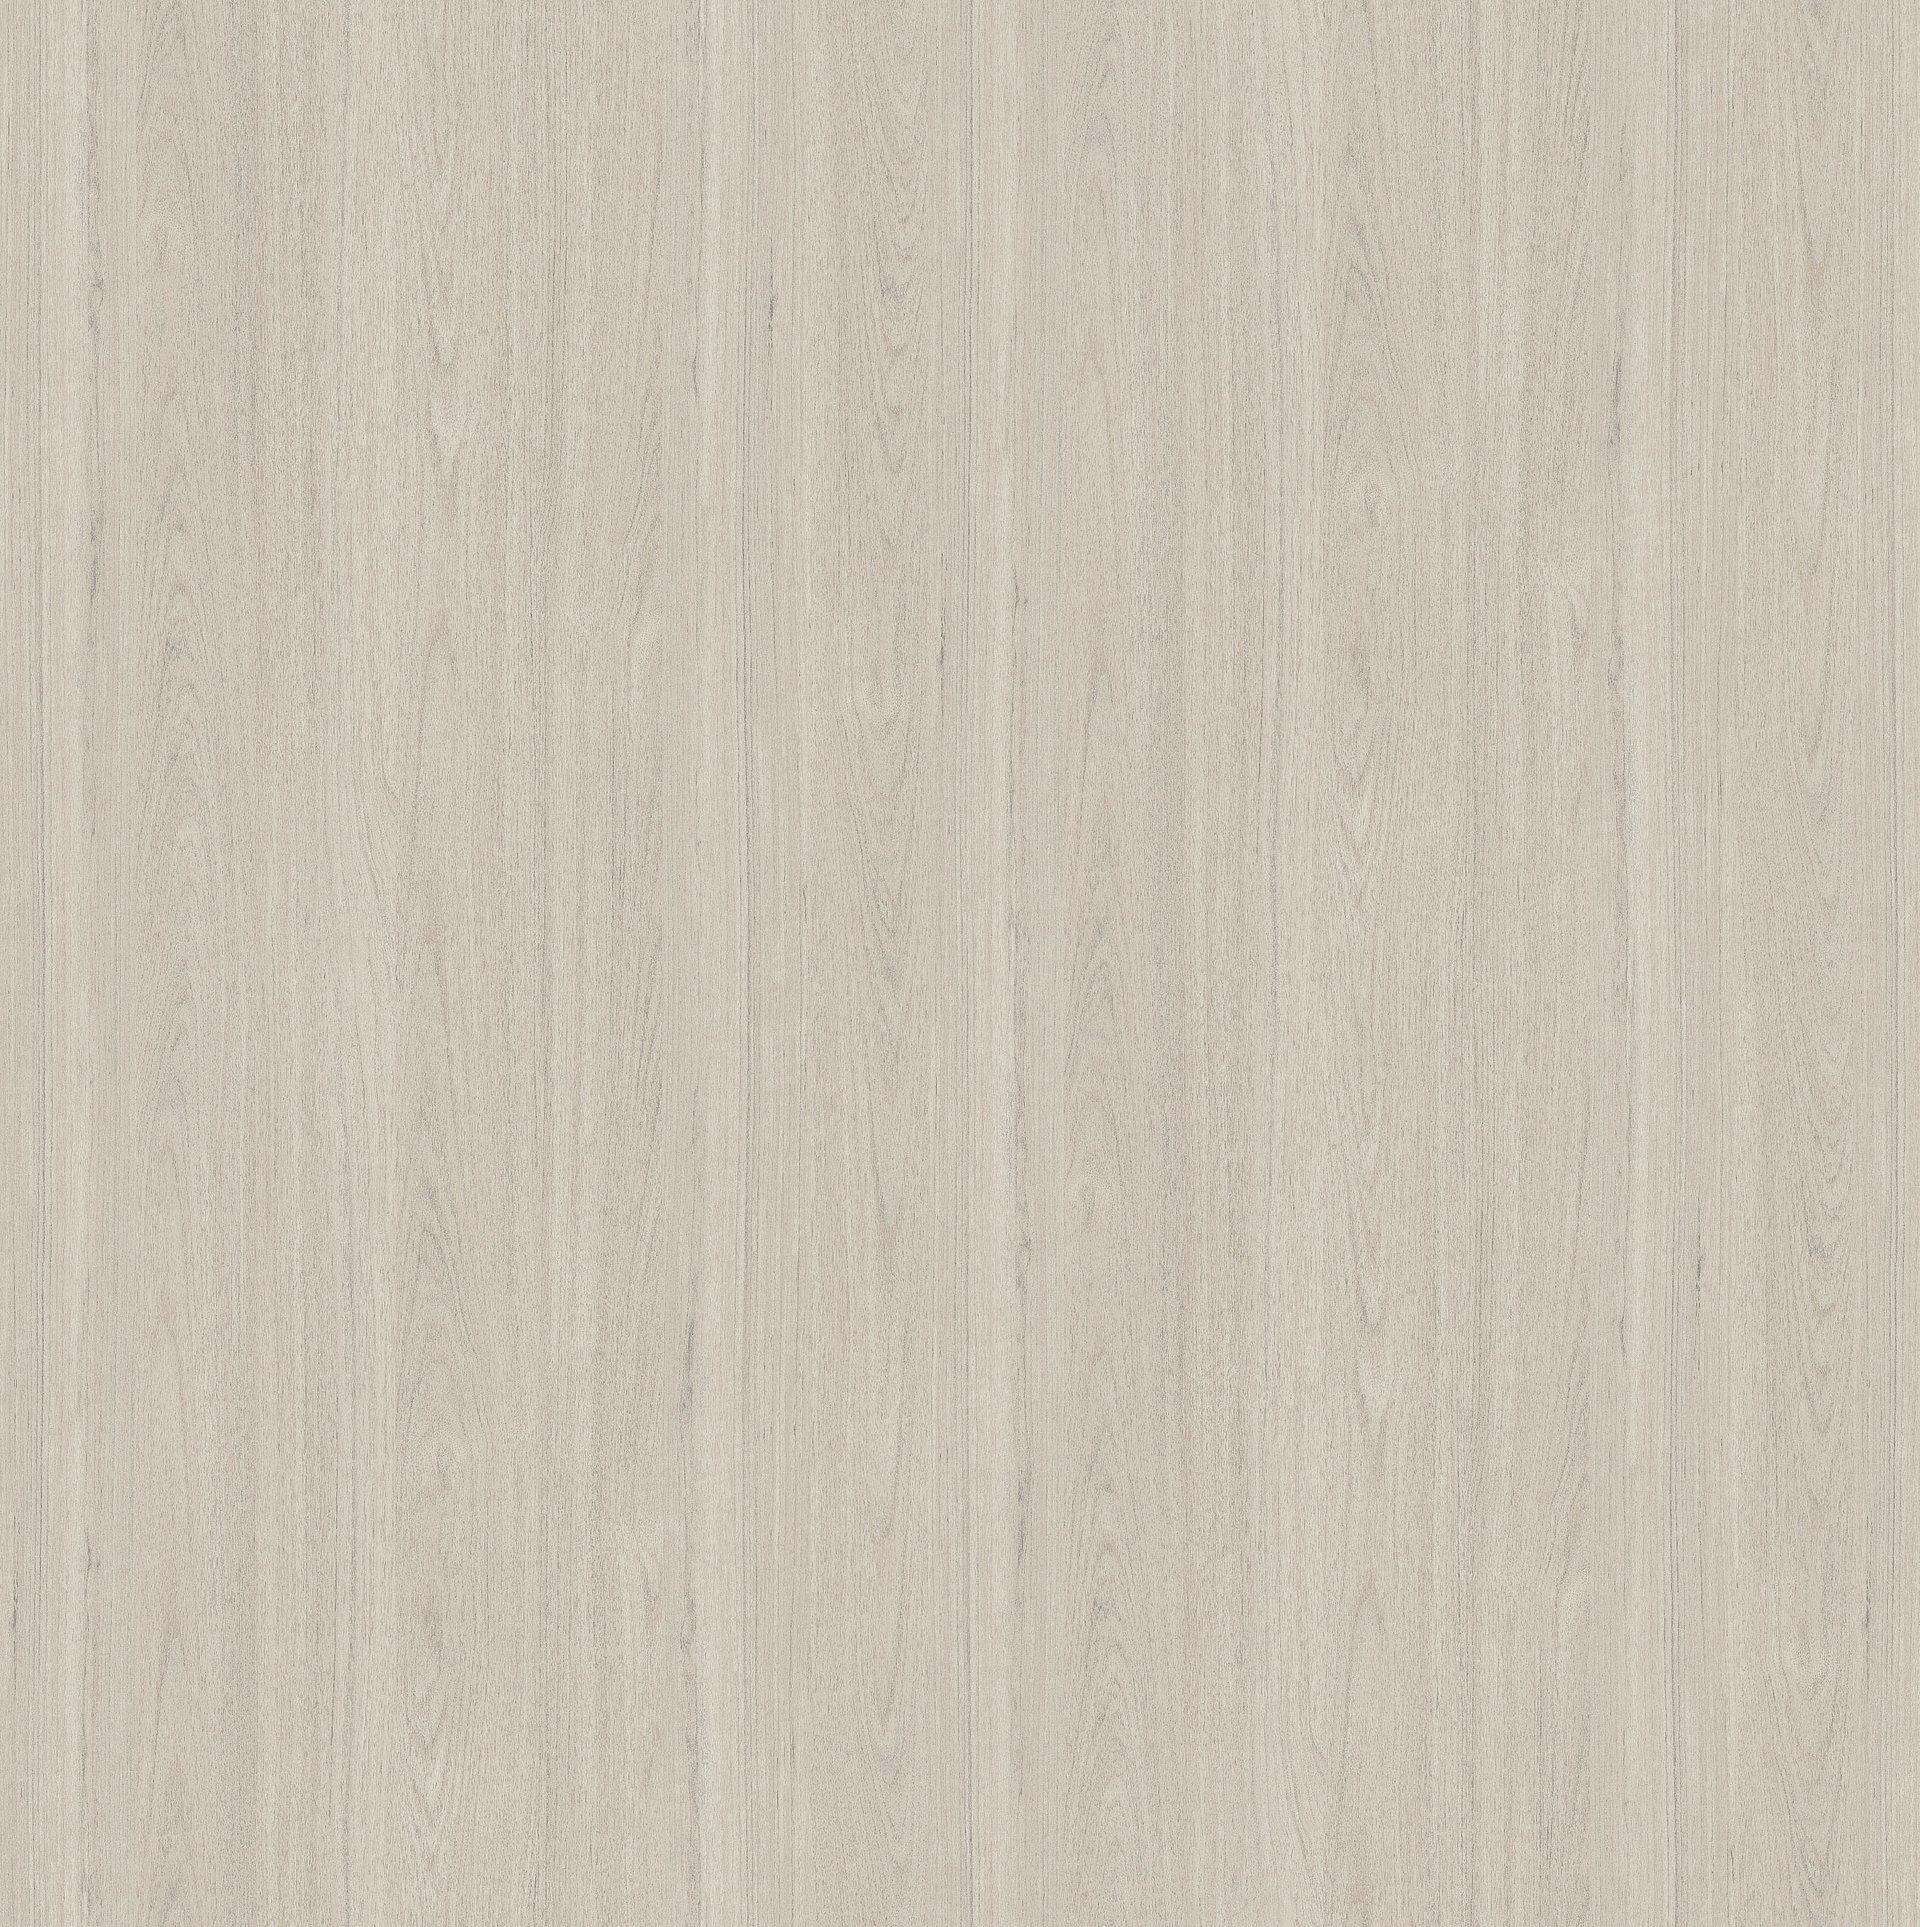 Nadstawka na Ladę Recepcyjną Victor V 066 B - Nordic Teak R50094